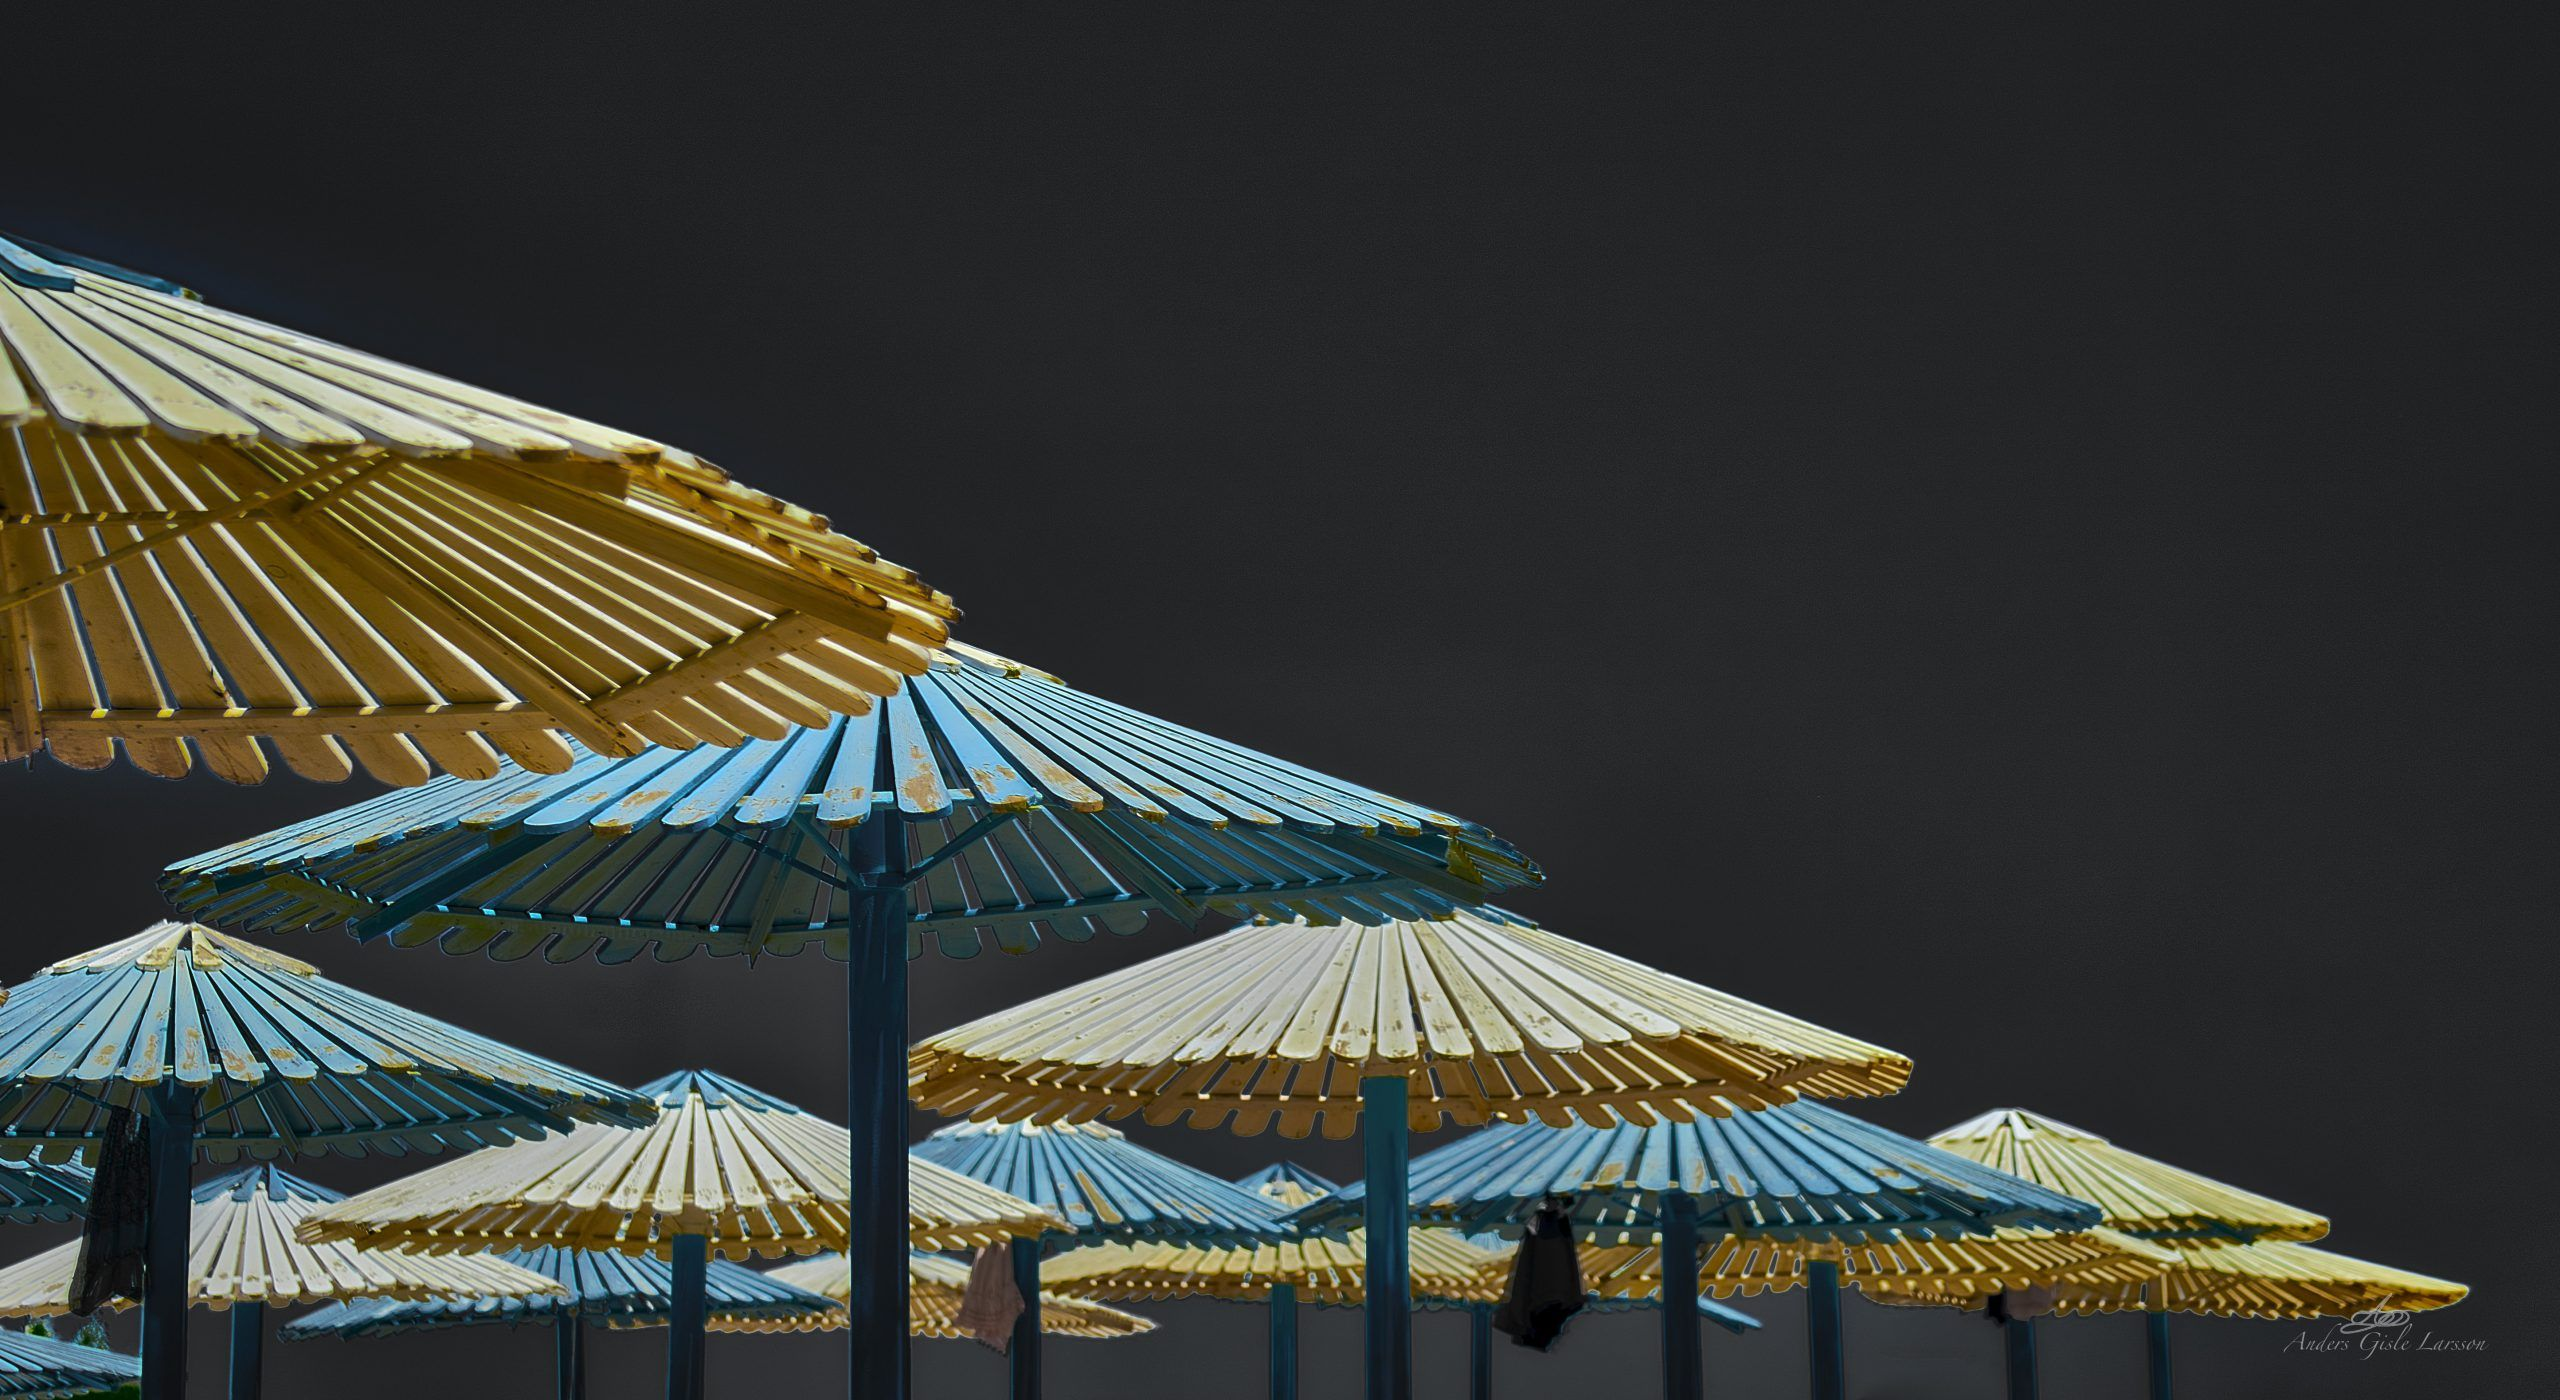 Holiday Umbrellas, 259/365, Uge 37, Hurghada, Egypten